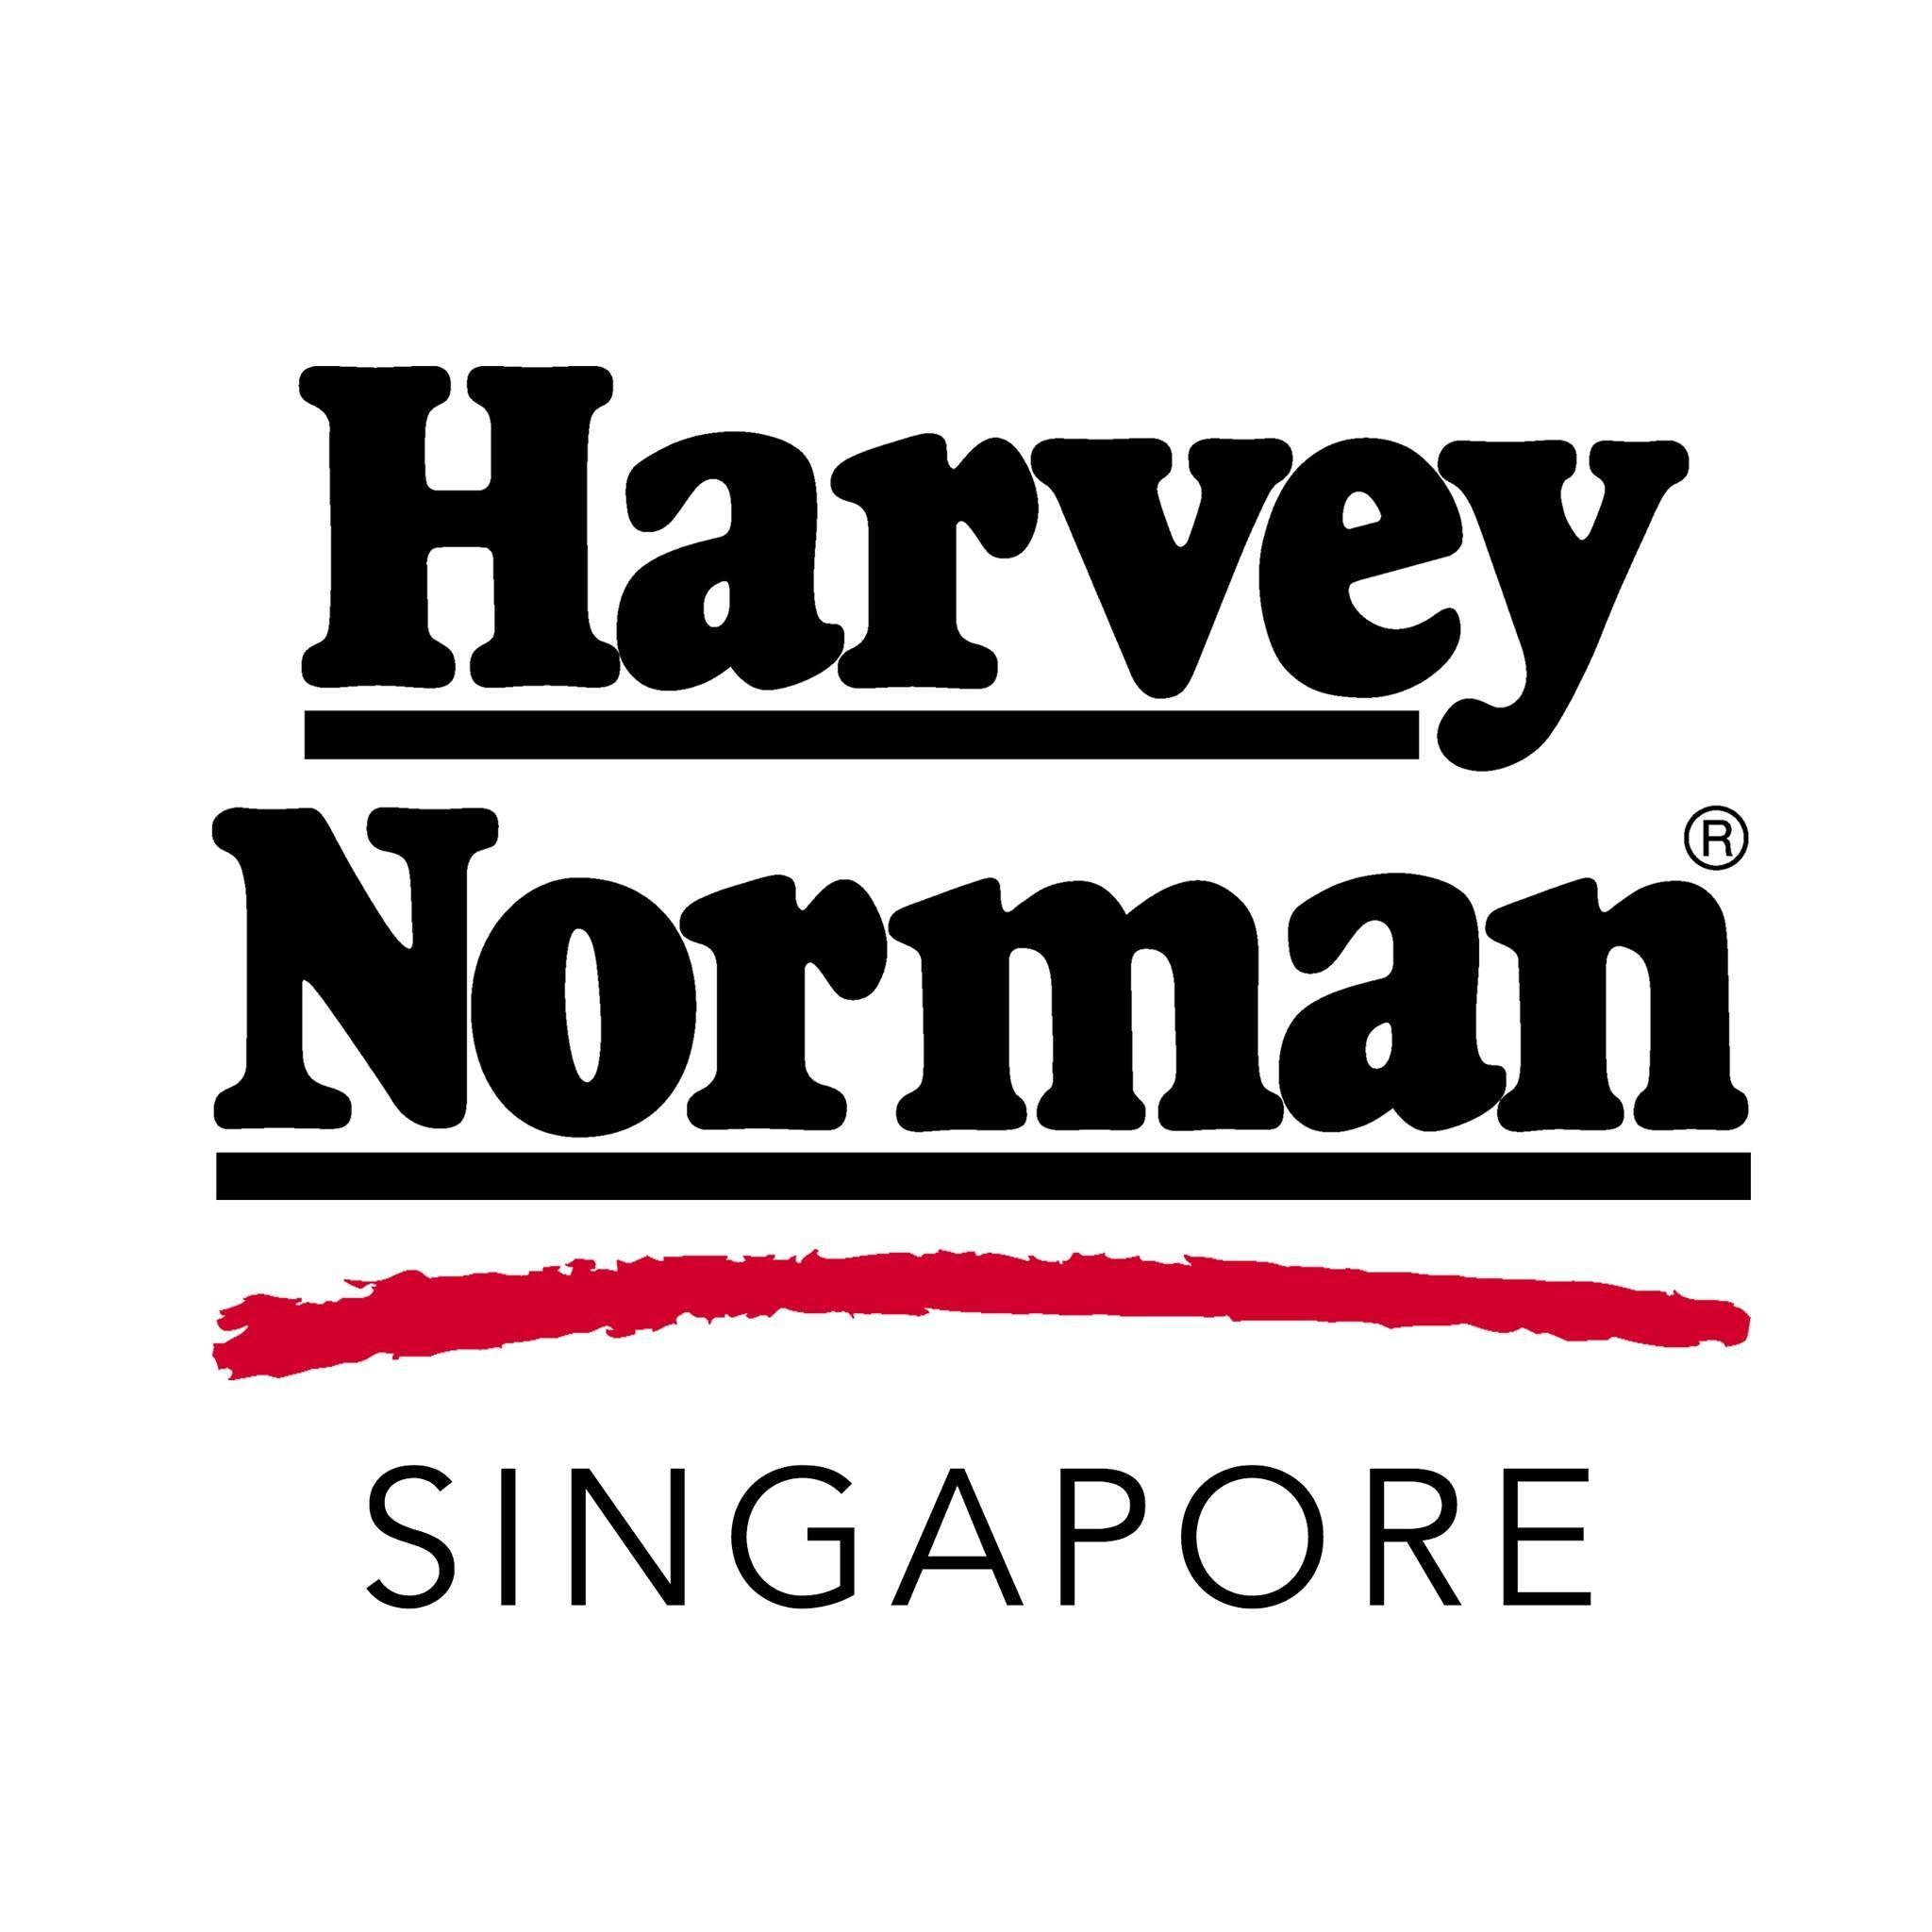 Harvey Norman (SG)